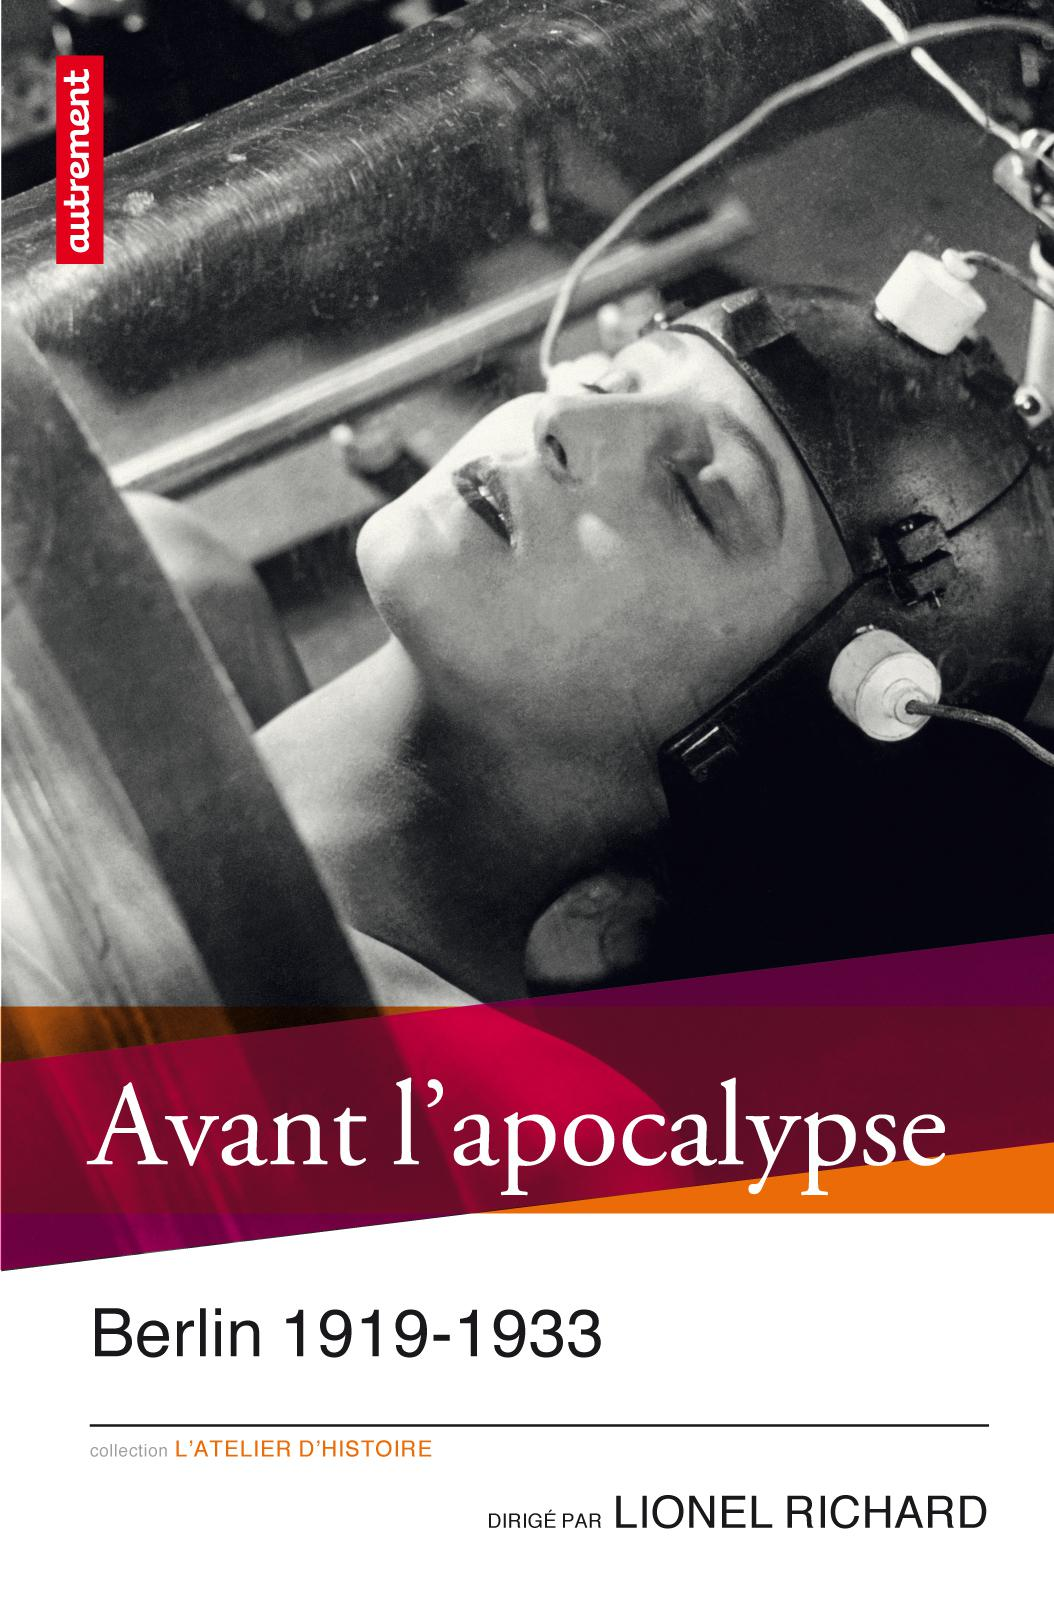 Avant l'apocalypse, BERLIN 1919-1933